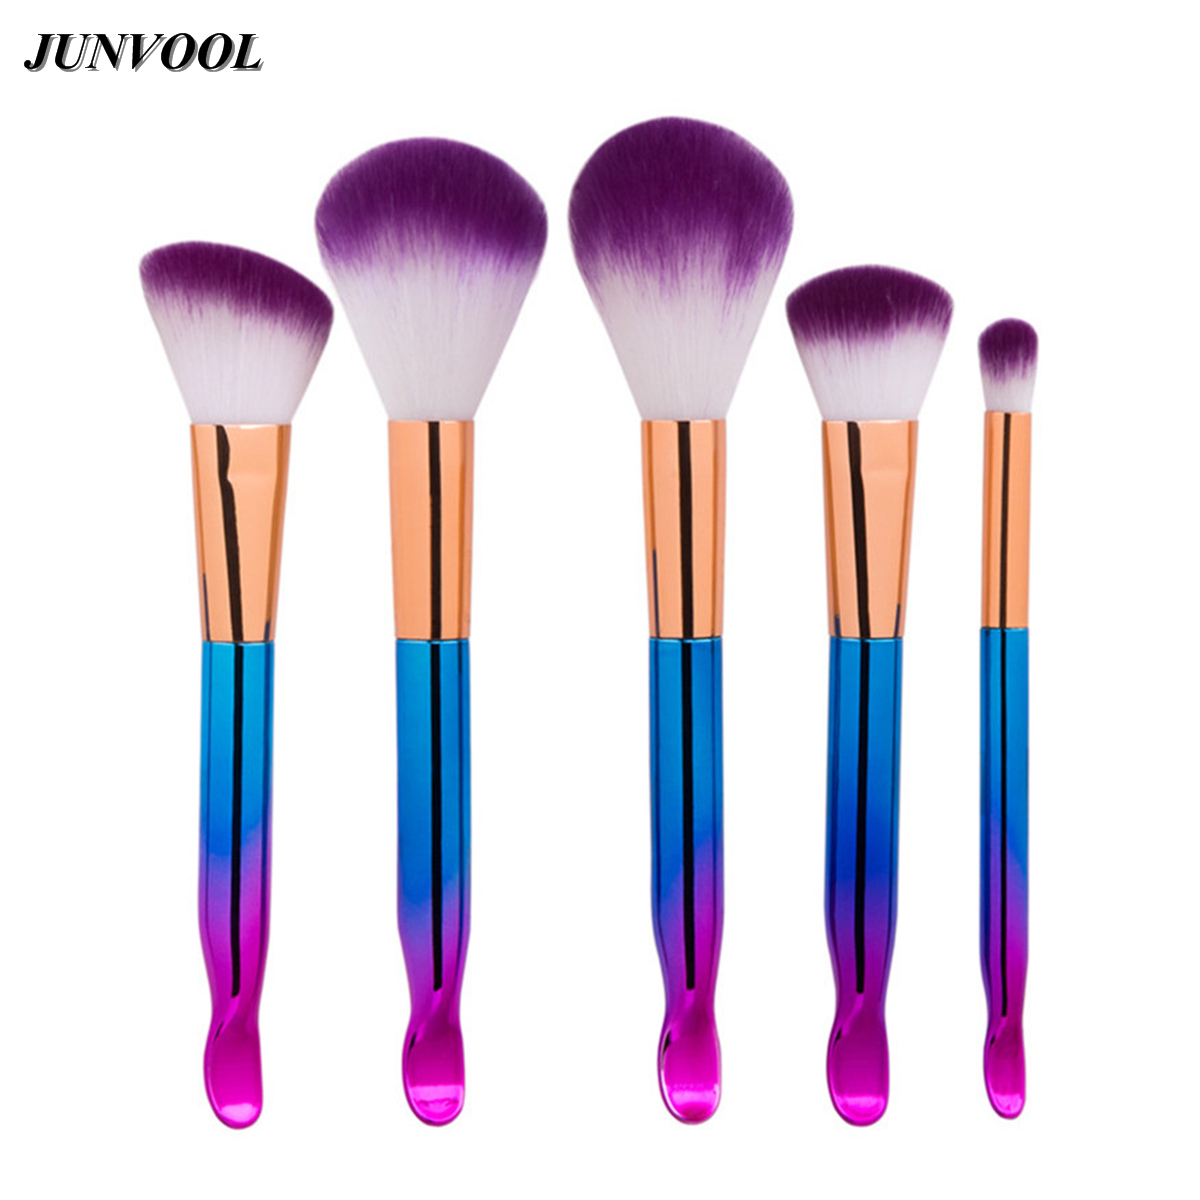 New Colorful Makeup Brush Set 5pcs Fashion Purple Hair Foundation Eyeshadow Blusher Make Up